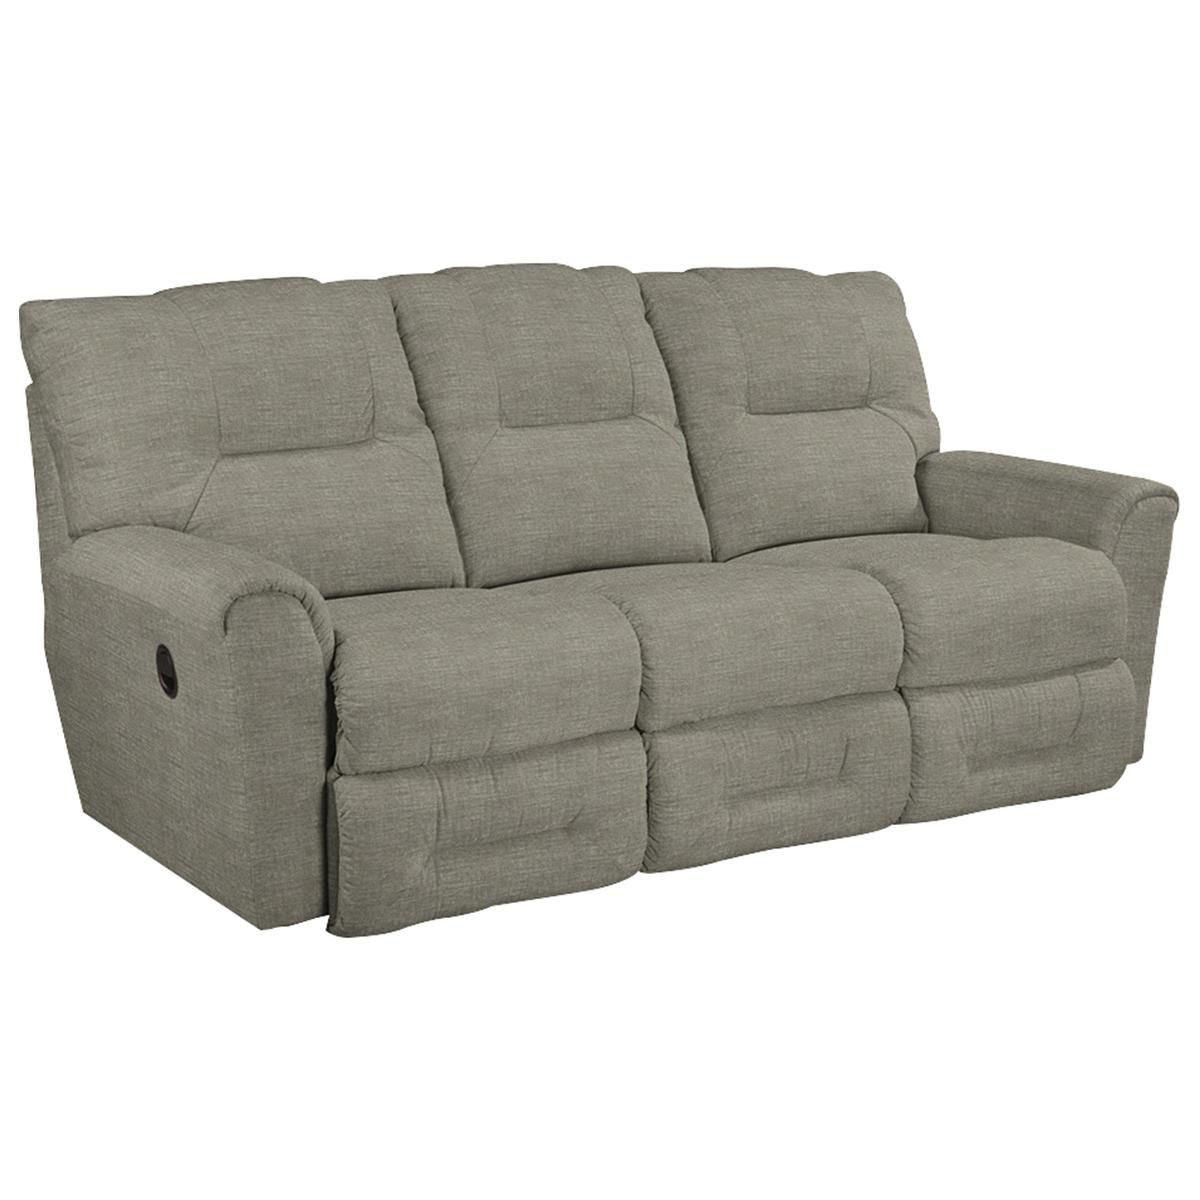 14++ Lazy boy sale sofas information